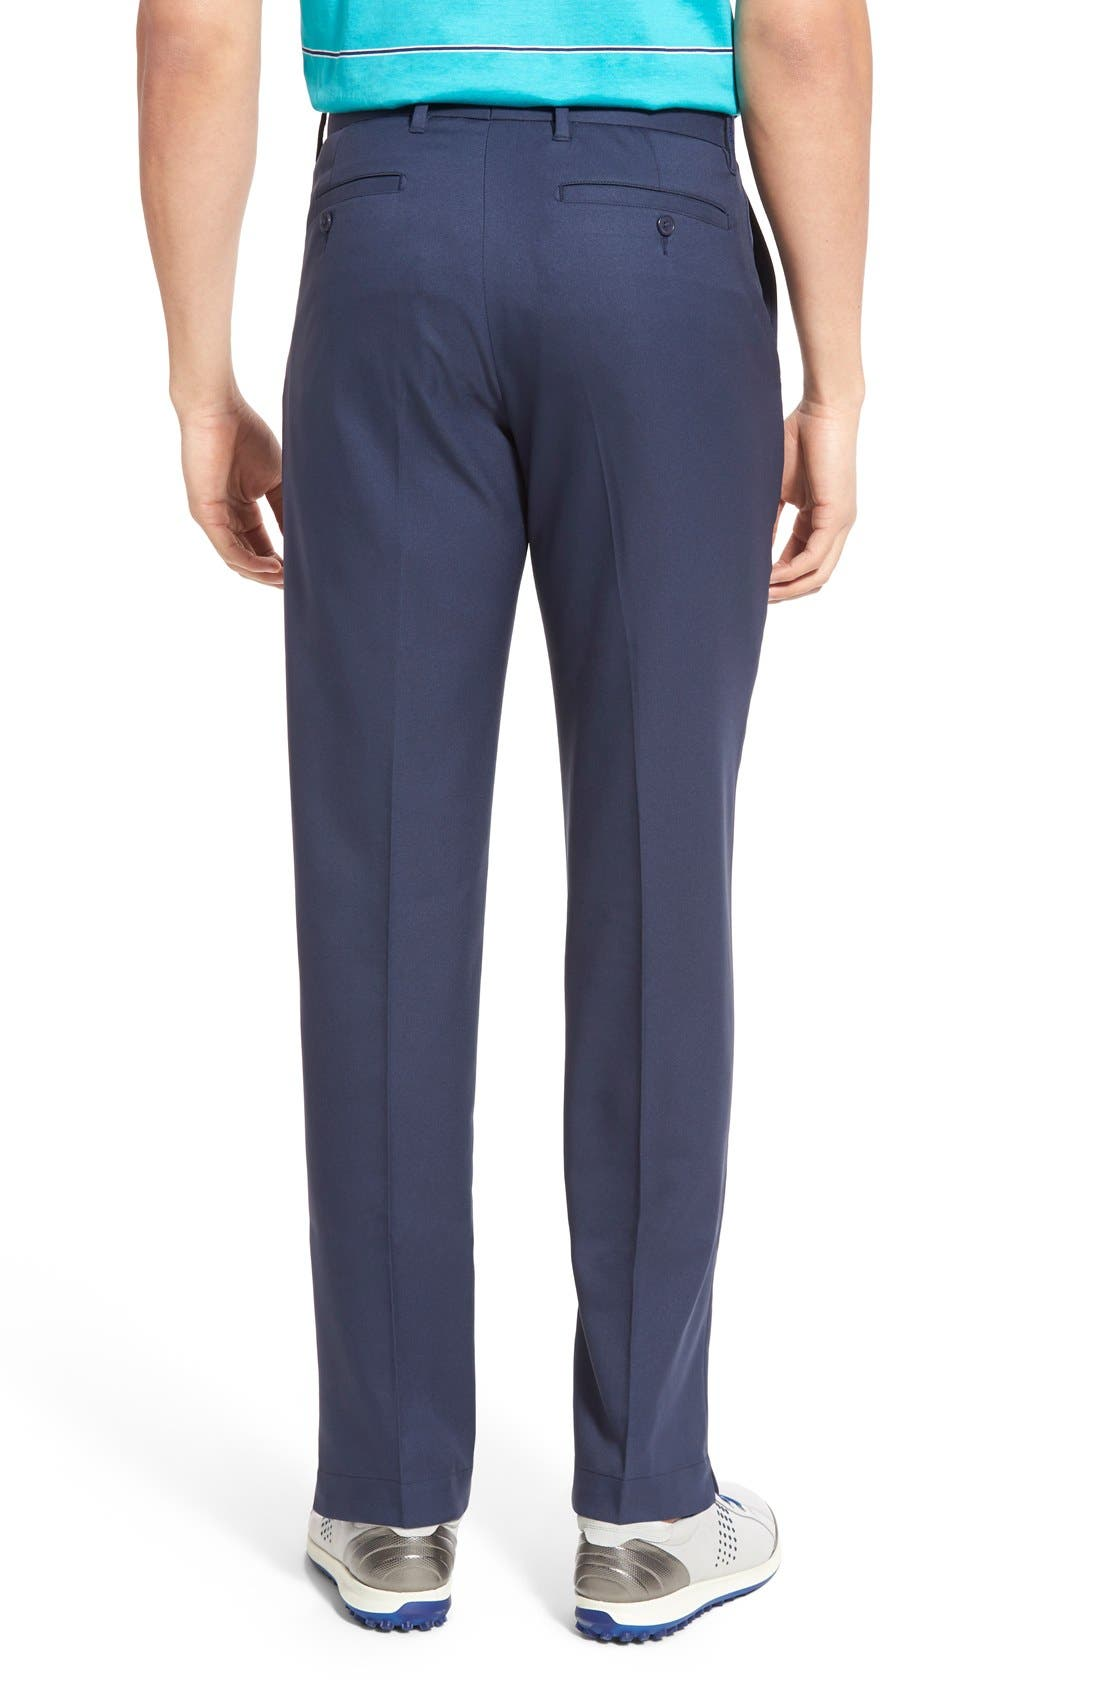 Alternate Image 2  - Bobby Jones 'Tech' Flat Front Wrinkle Free Golf Pants